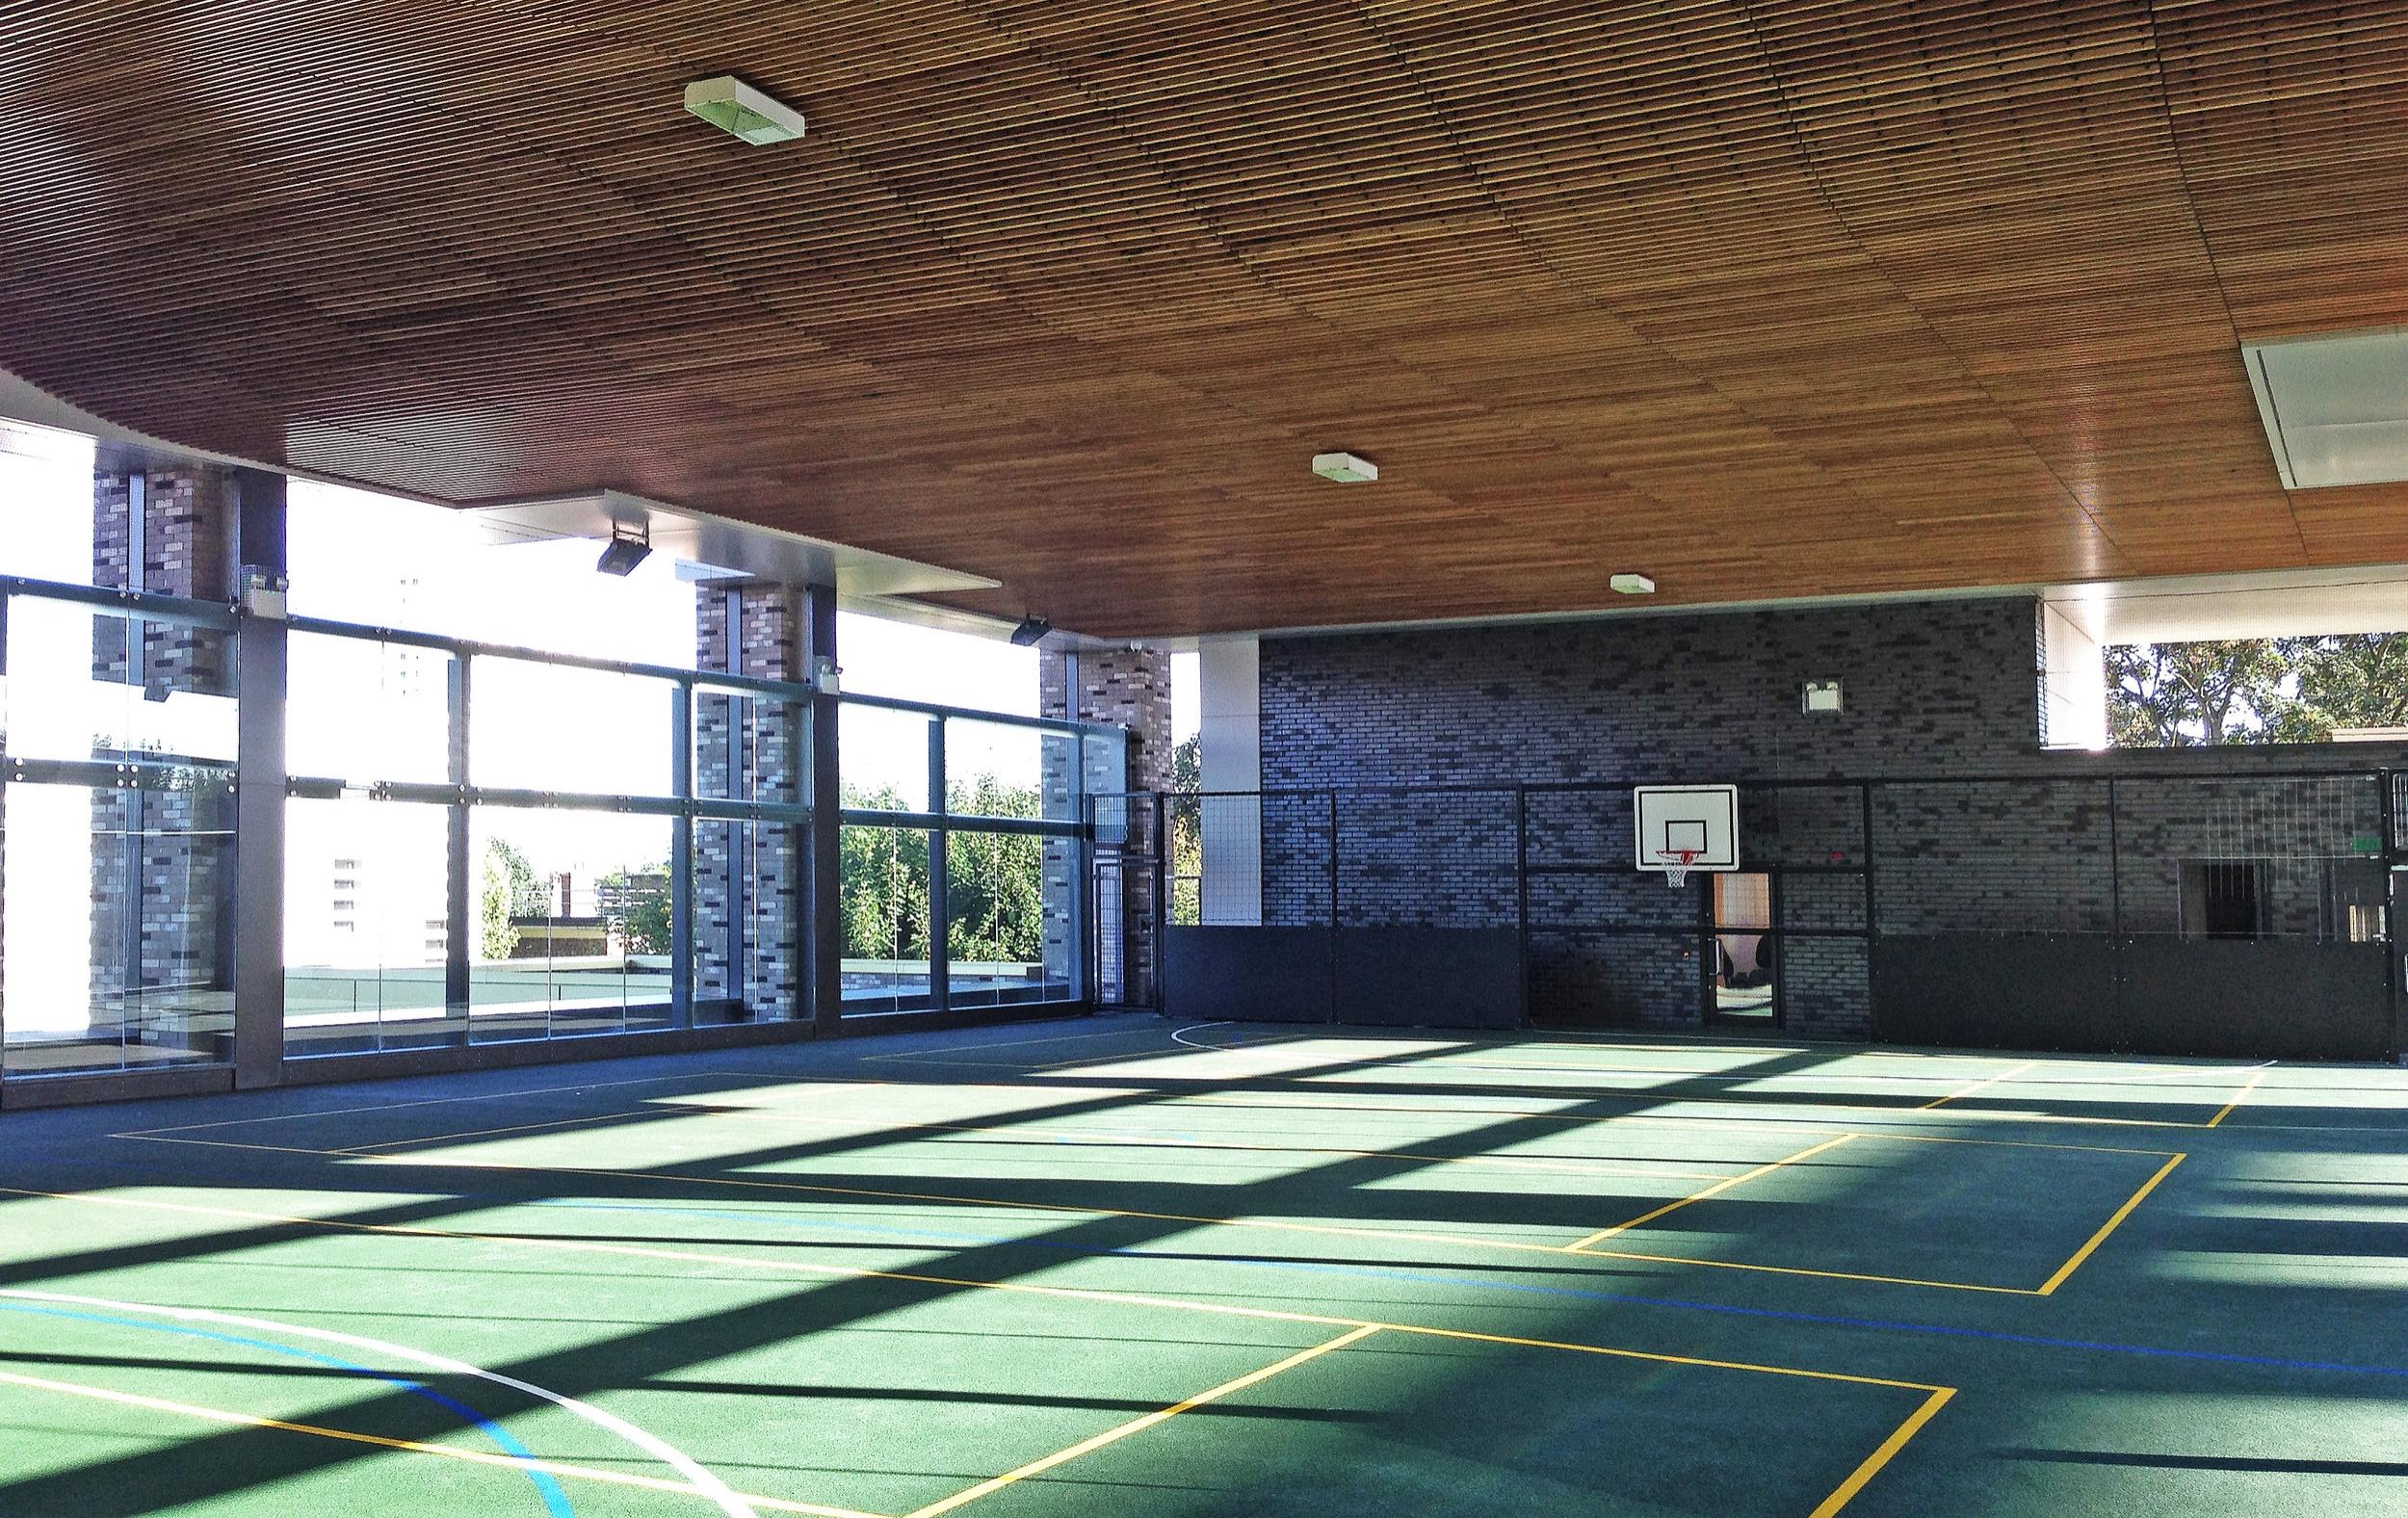 (JF) Second floor / deck level MUGA